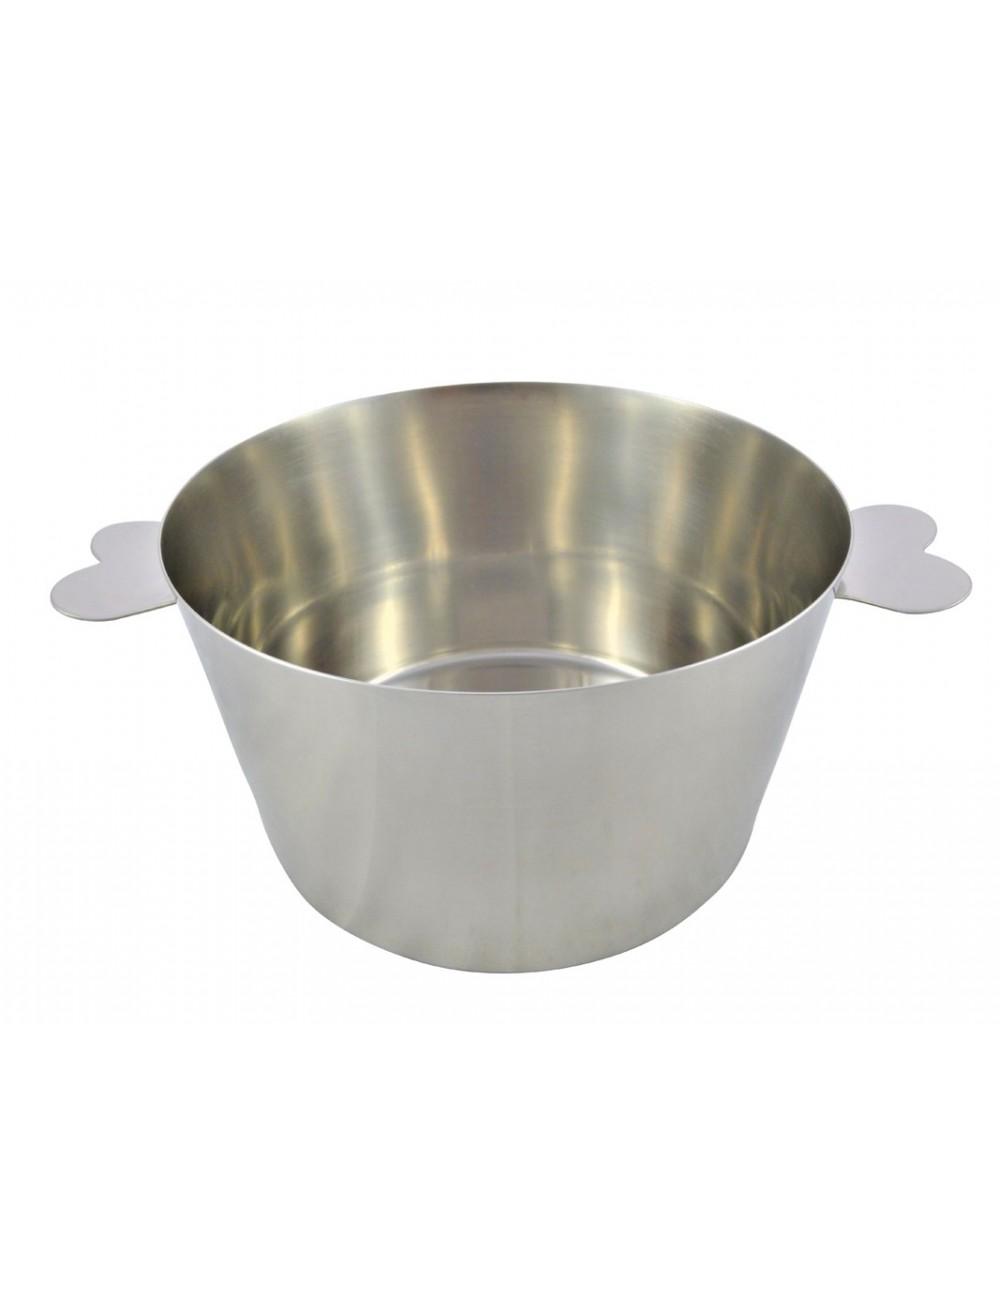 CHARLOTTE PAN - STAINLESS STEEL